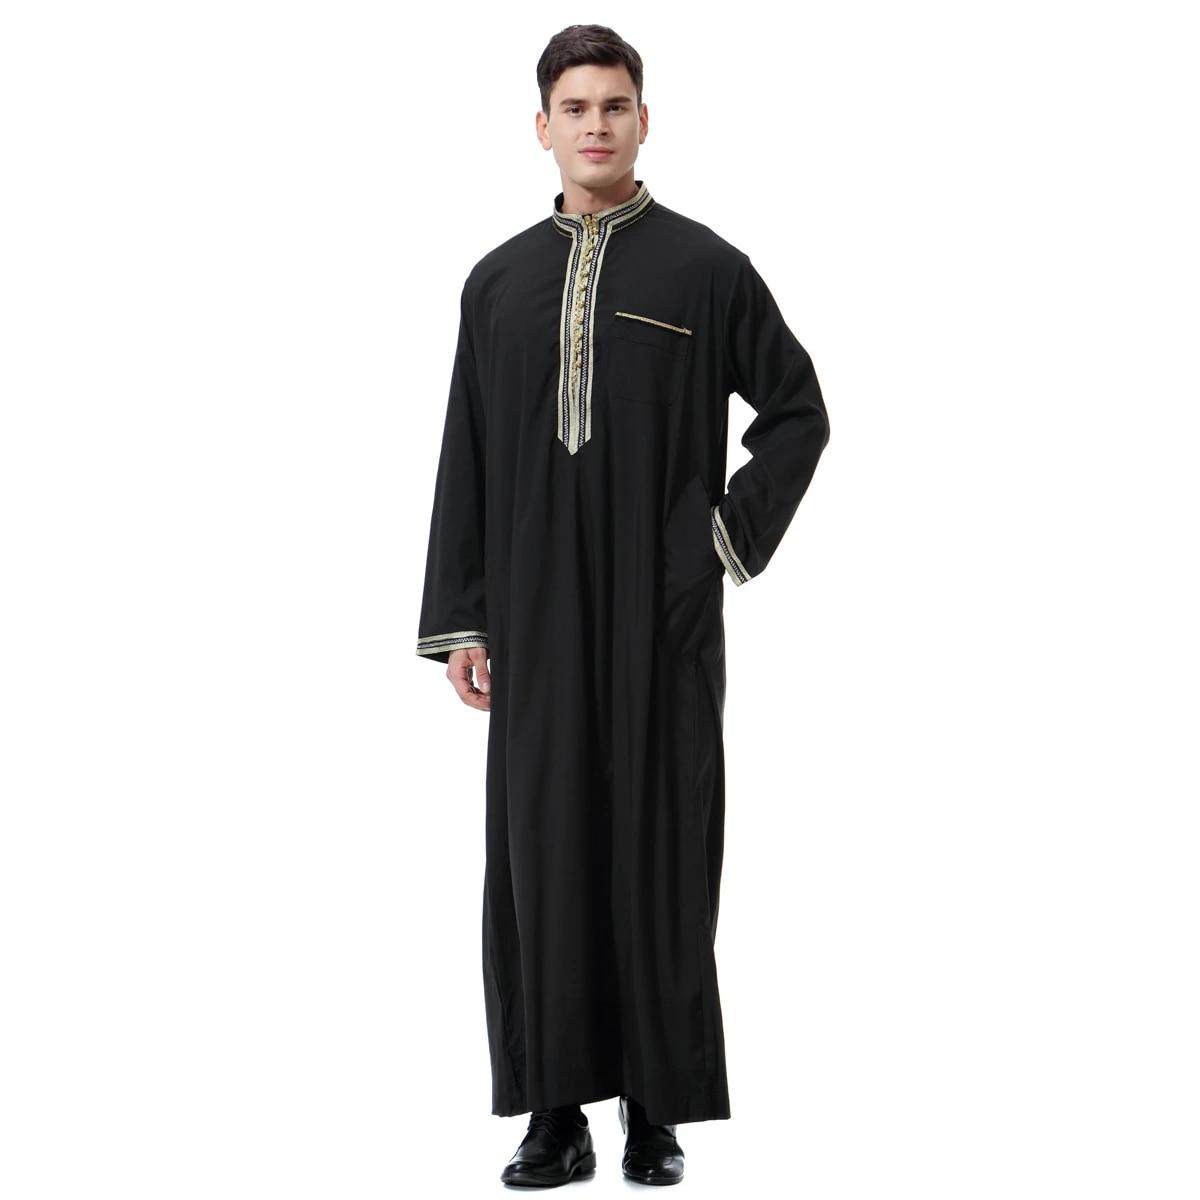 \u0130slamic prayer jubbah,Long  Dress,Prayer Dress,Islamic Men/'s Dress,Muslim Dress,Jubbah,islamic mens jubbah,prayer jubbah